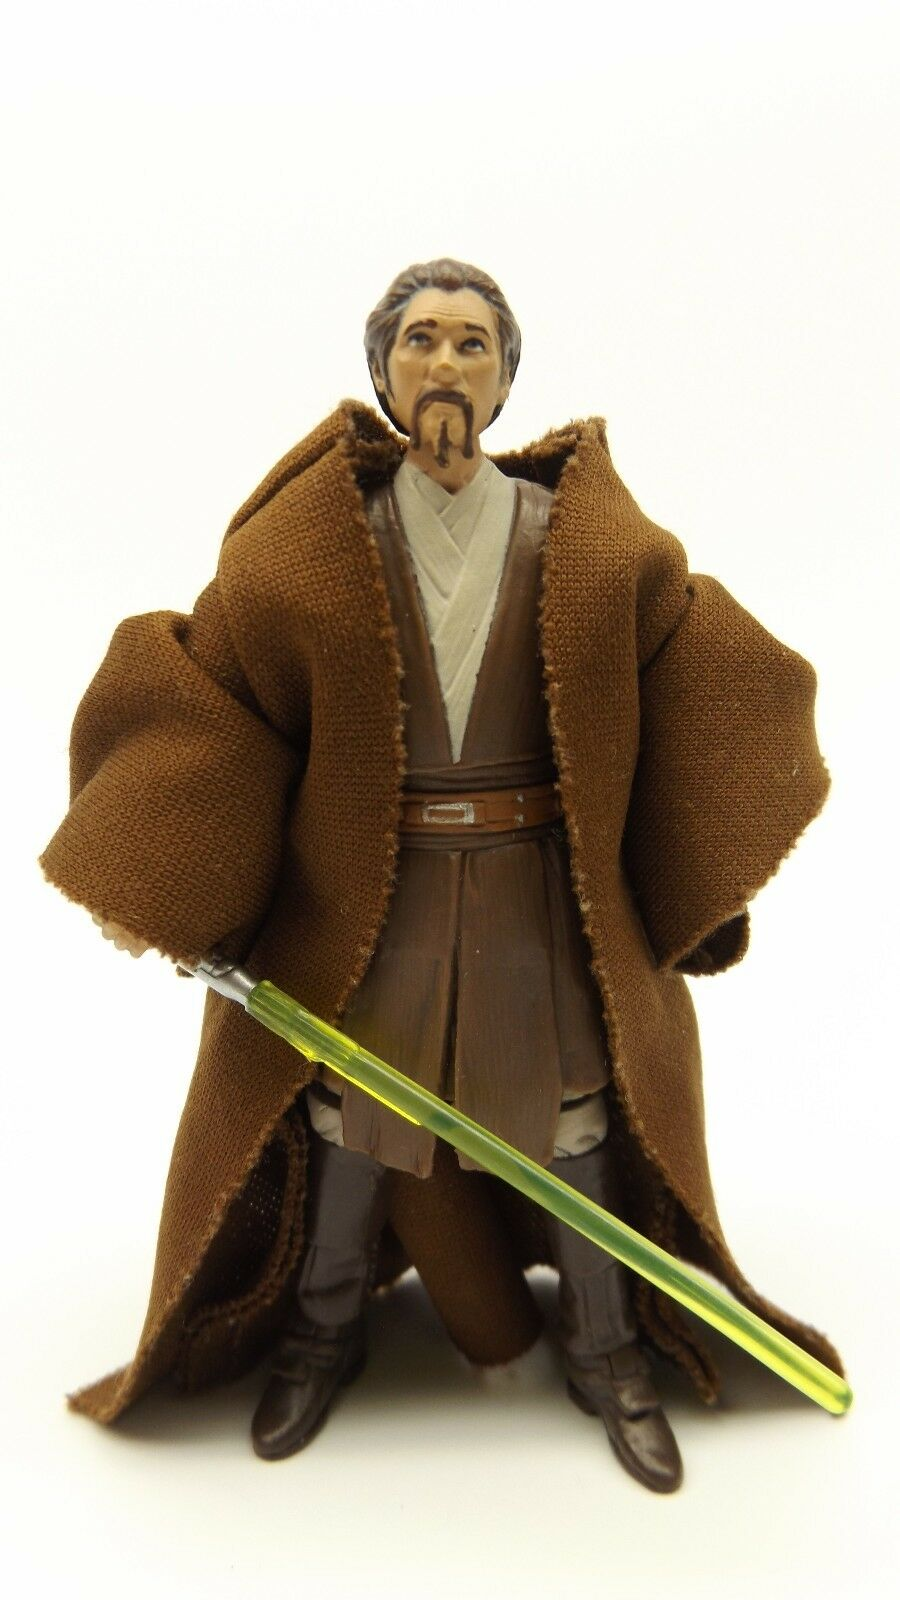 Star Wars Legacy Collection Geonosis Arena Nicanas Tassu Jedi Loose Complete